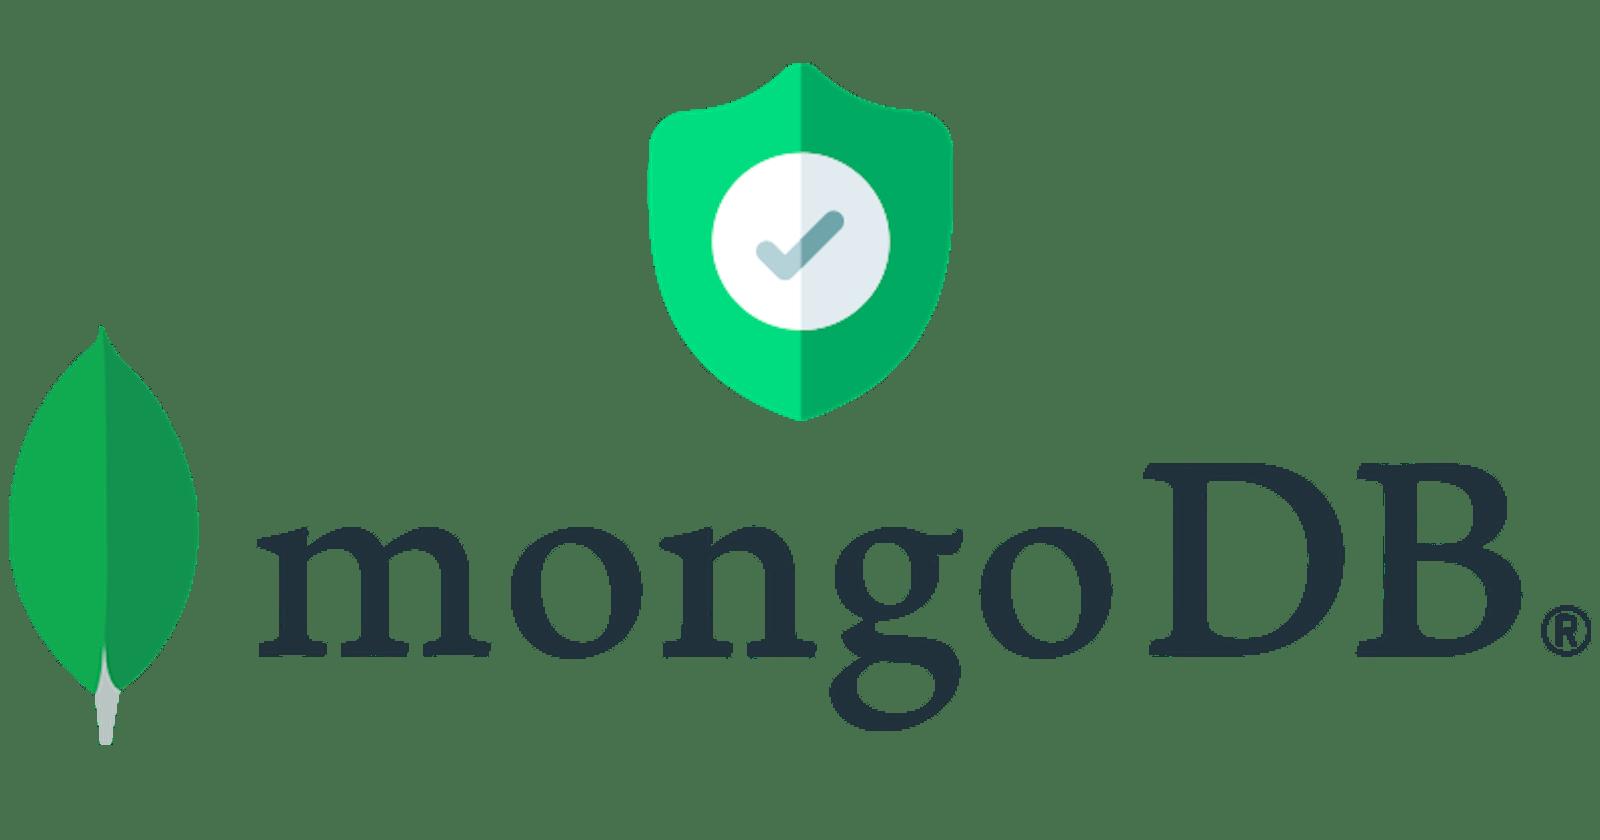 MongoDB - Security & Lockdown of your database